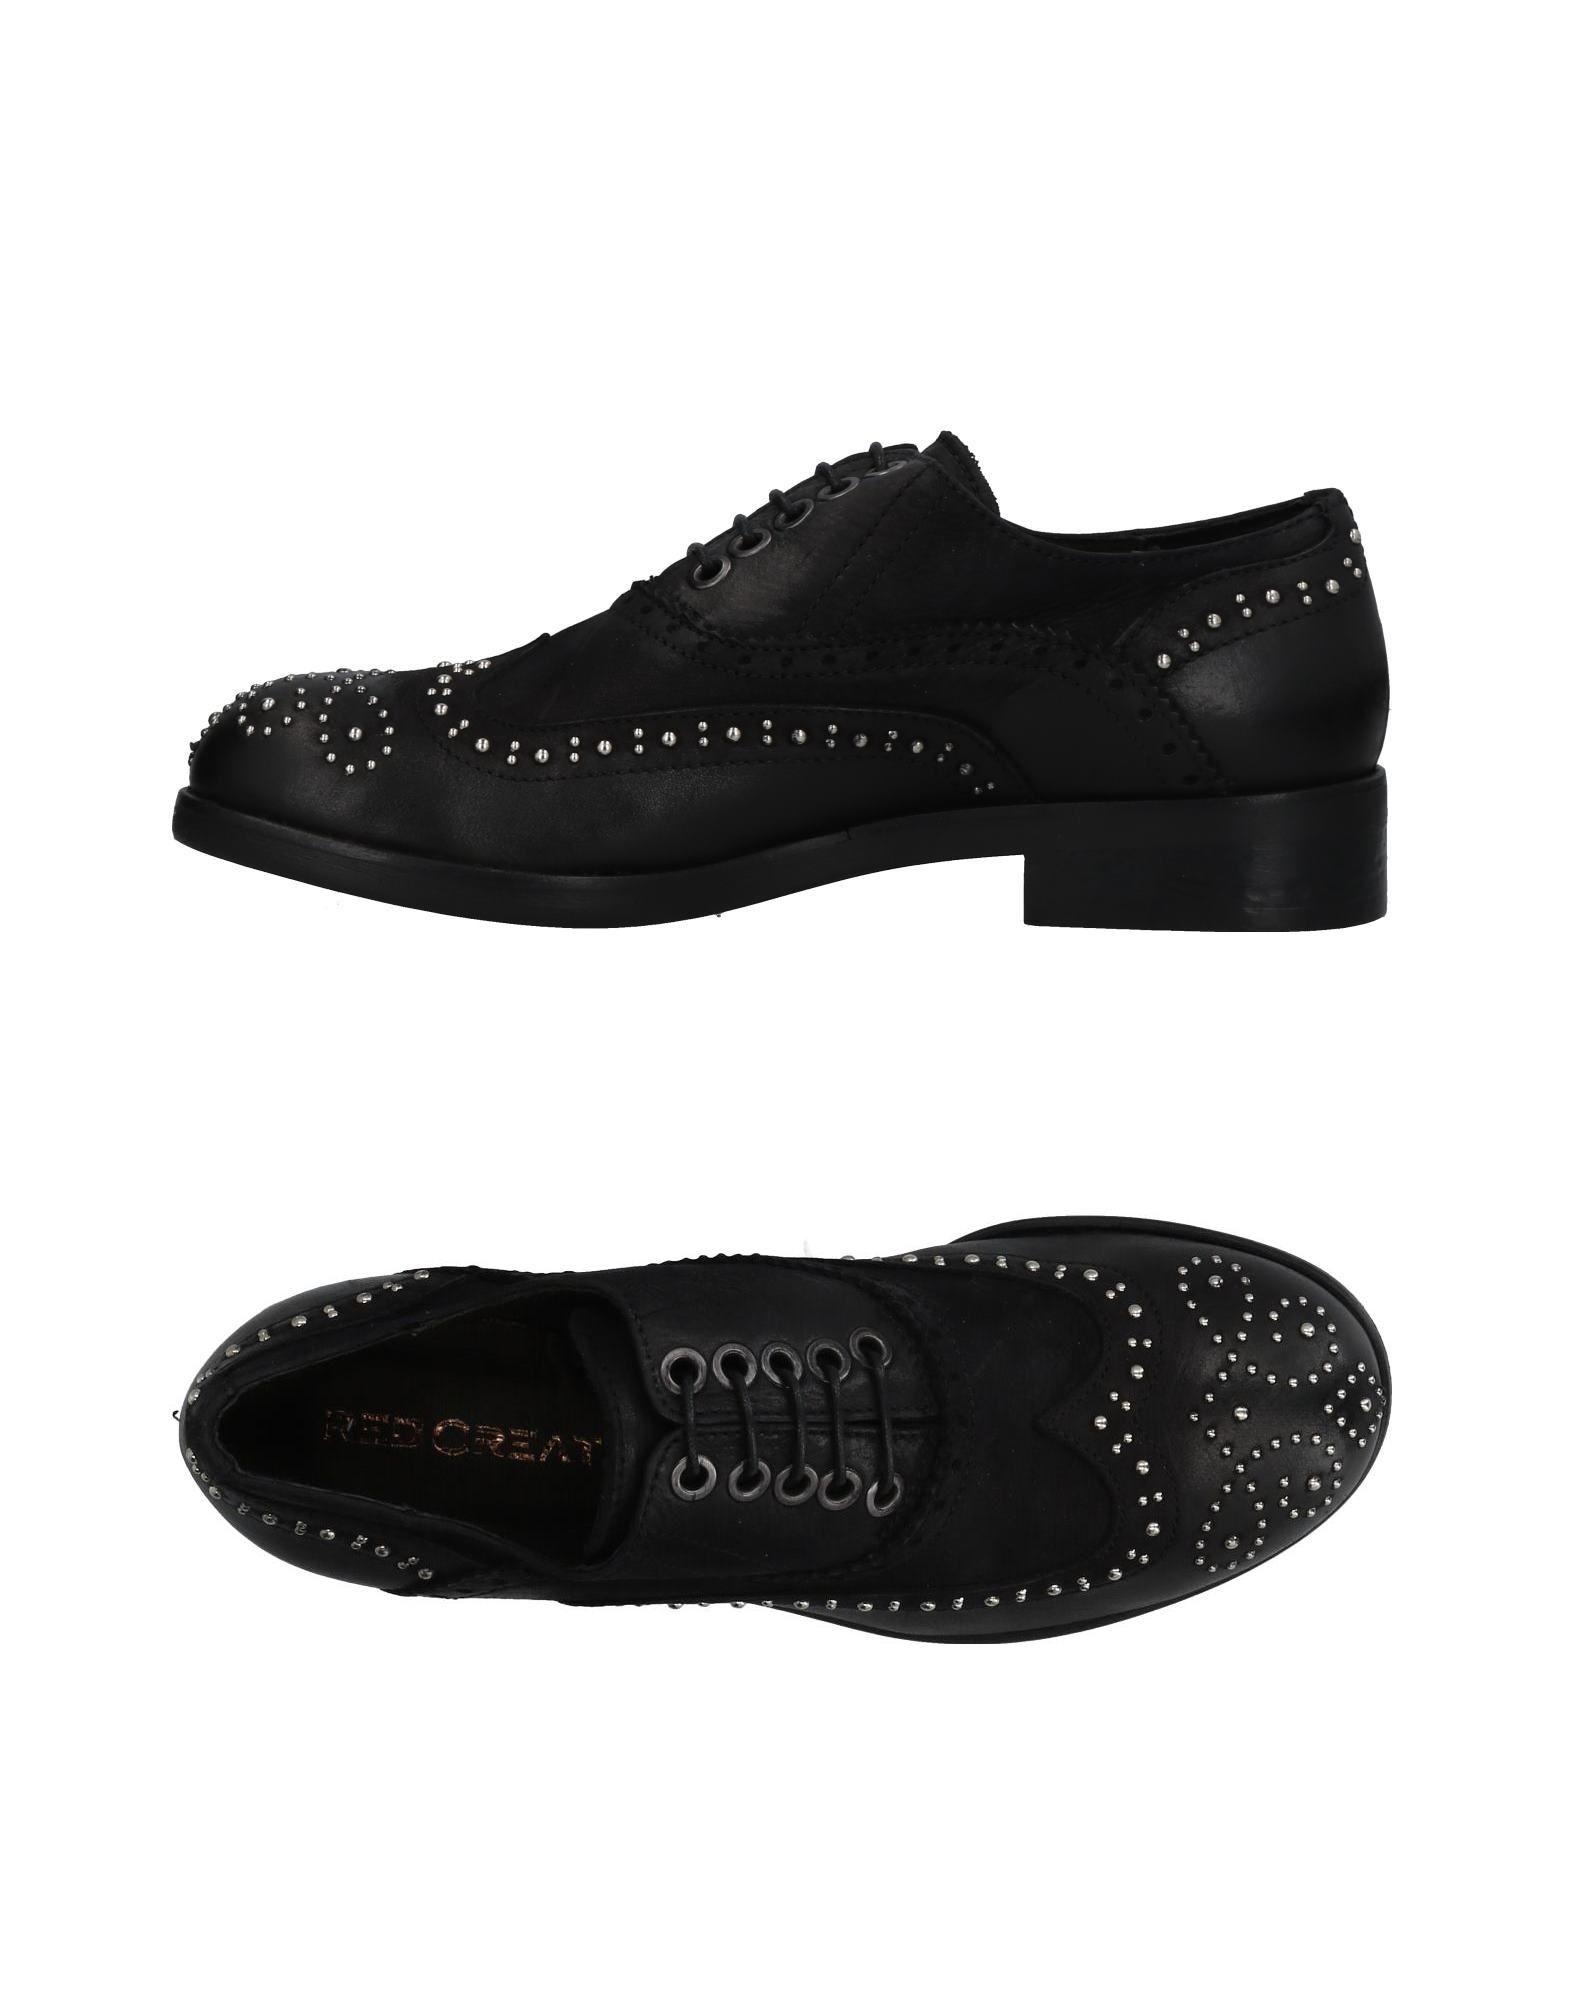 Red Creatyve Damen Schnürschuhe Damen Creatyve  11458645UH Neue Schuhe 4b253d